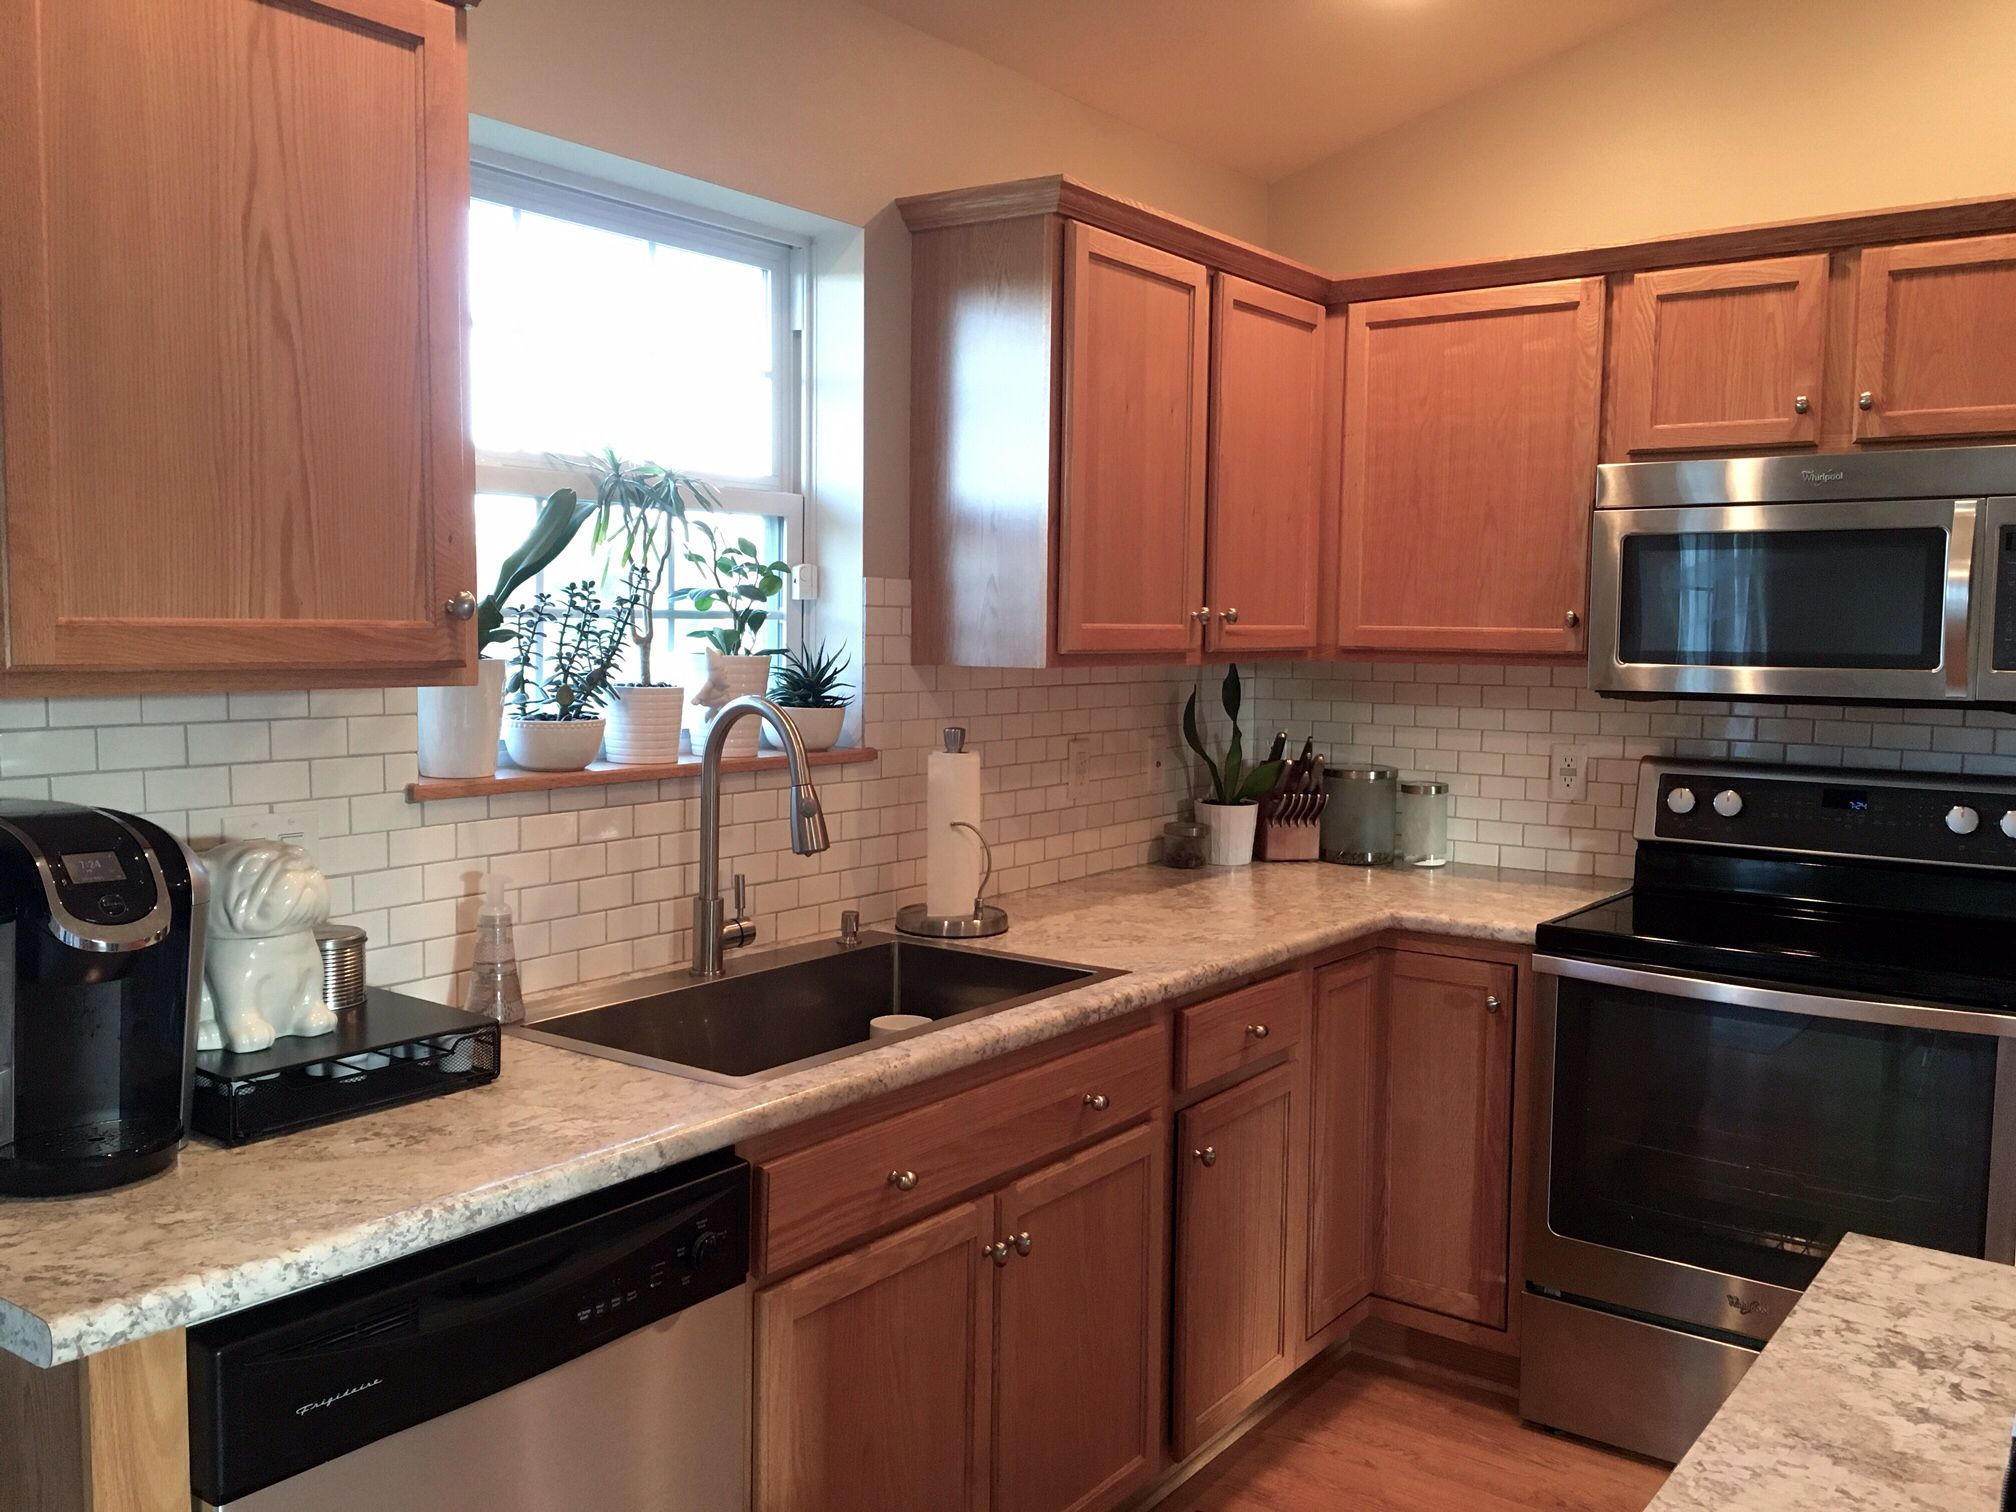 white laminate kitchen cabinets craigslist light color idea don 39t like the subway tile backsplash